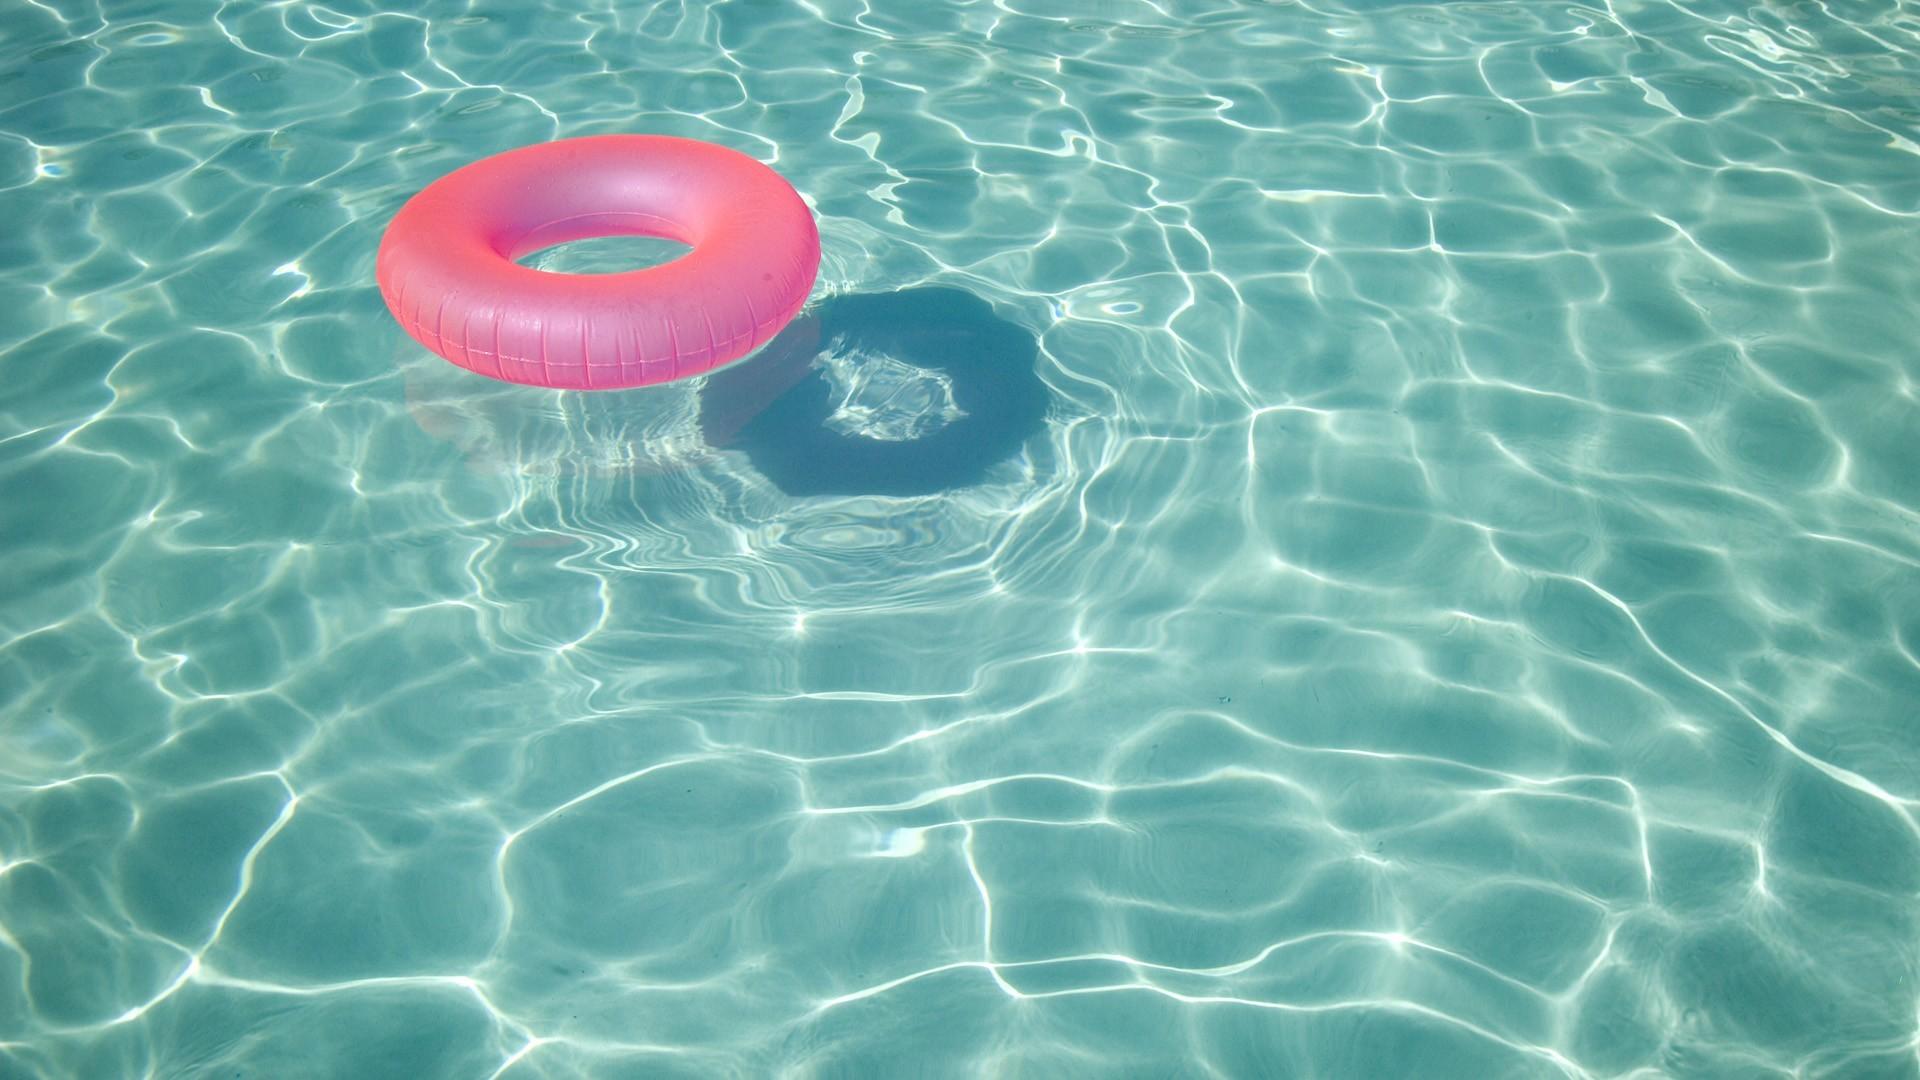 1138711 cute summer wallpaper 1920x1080 picture